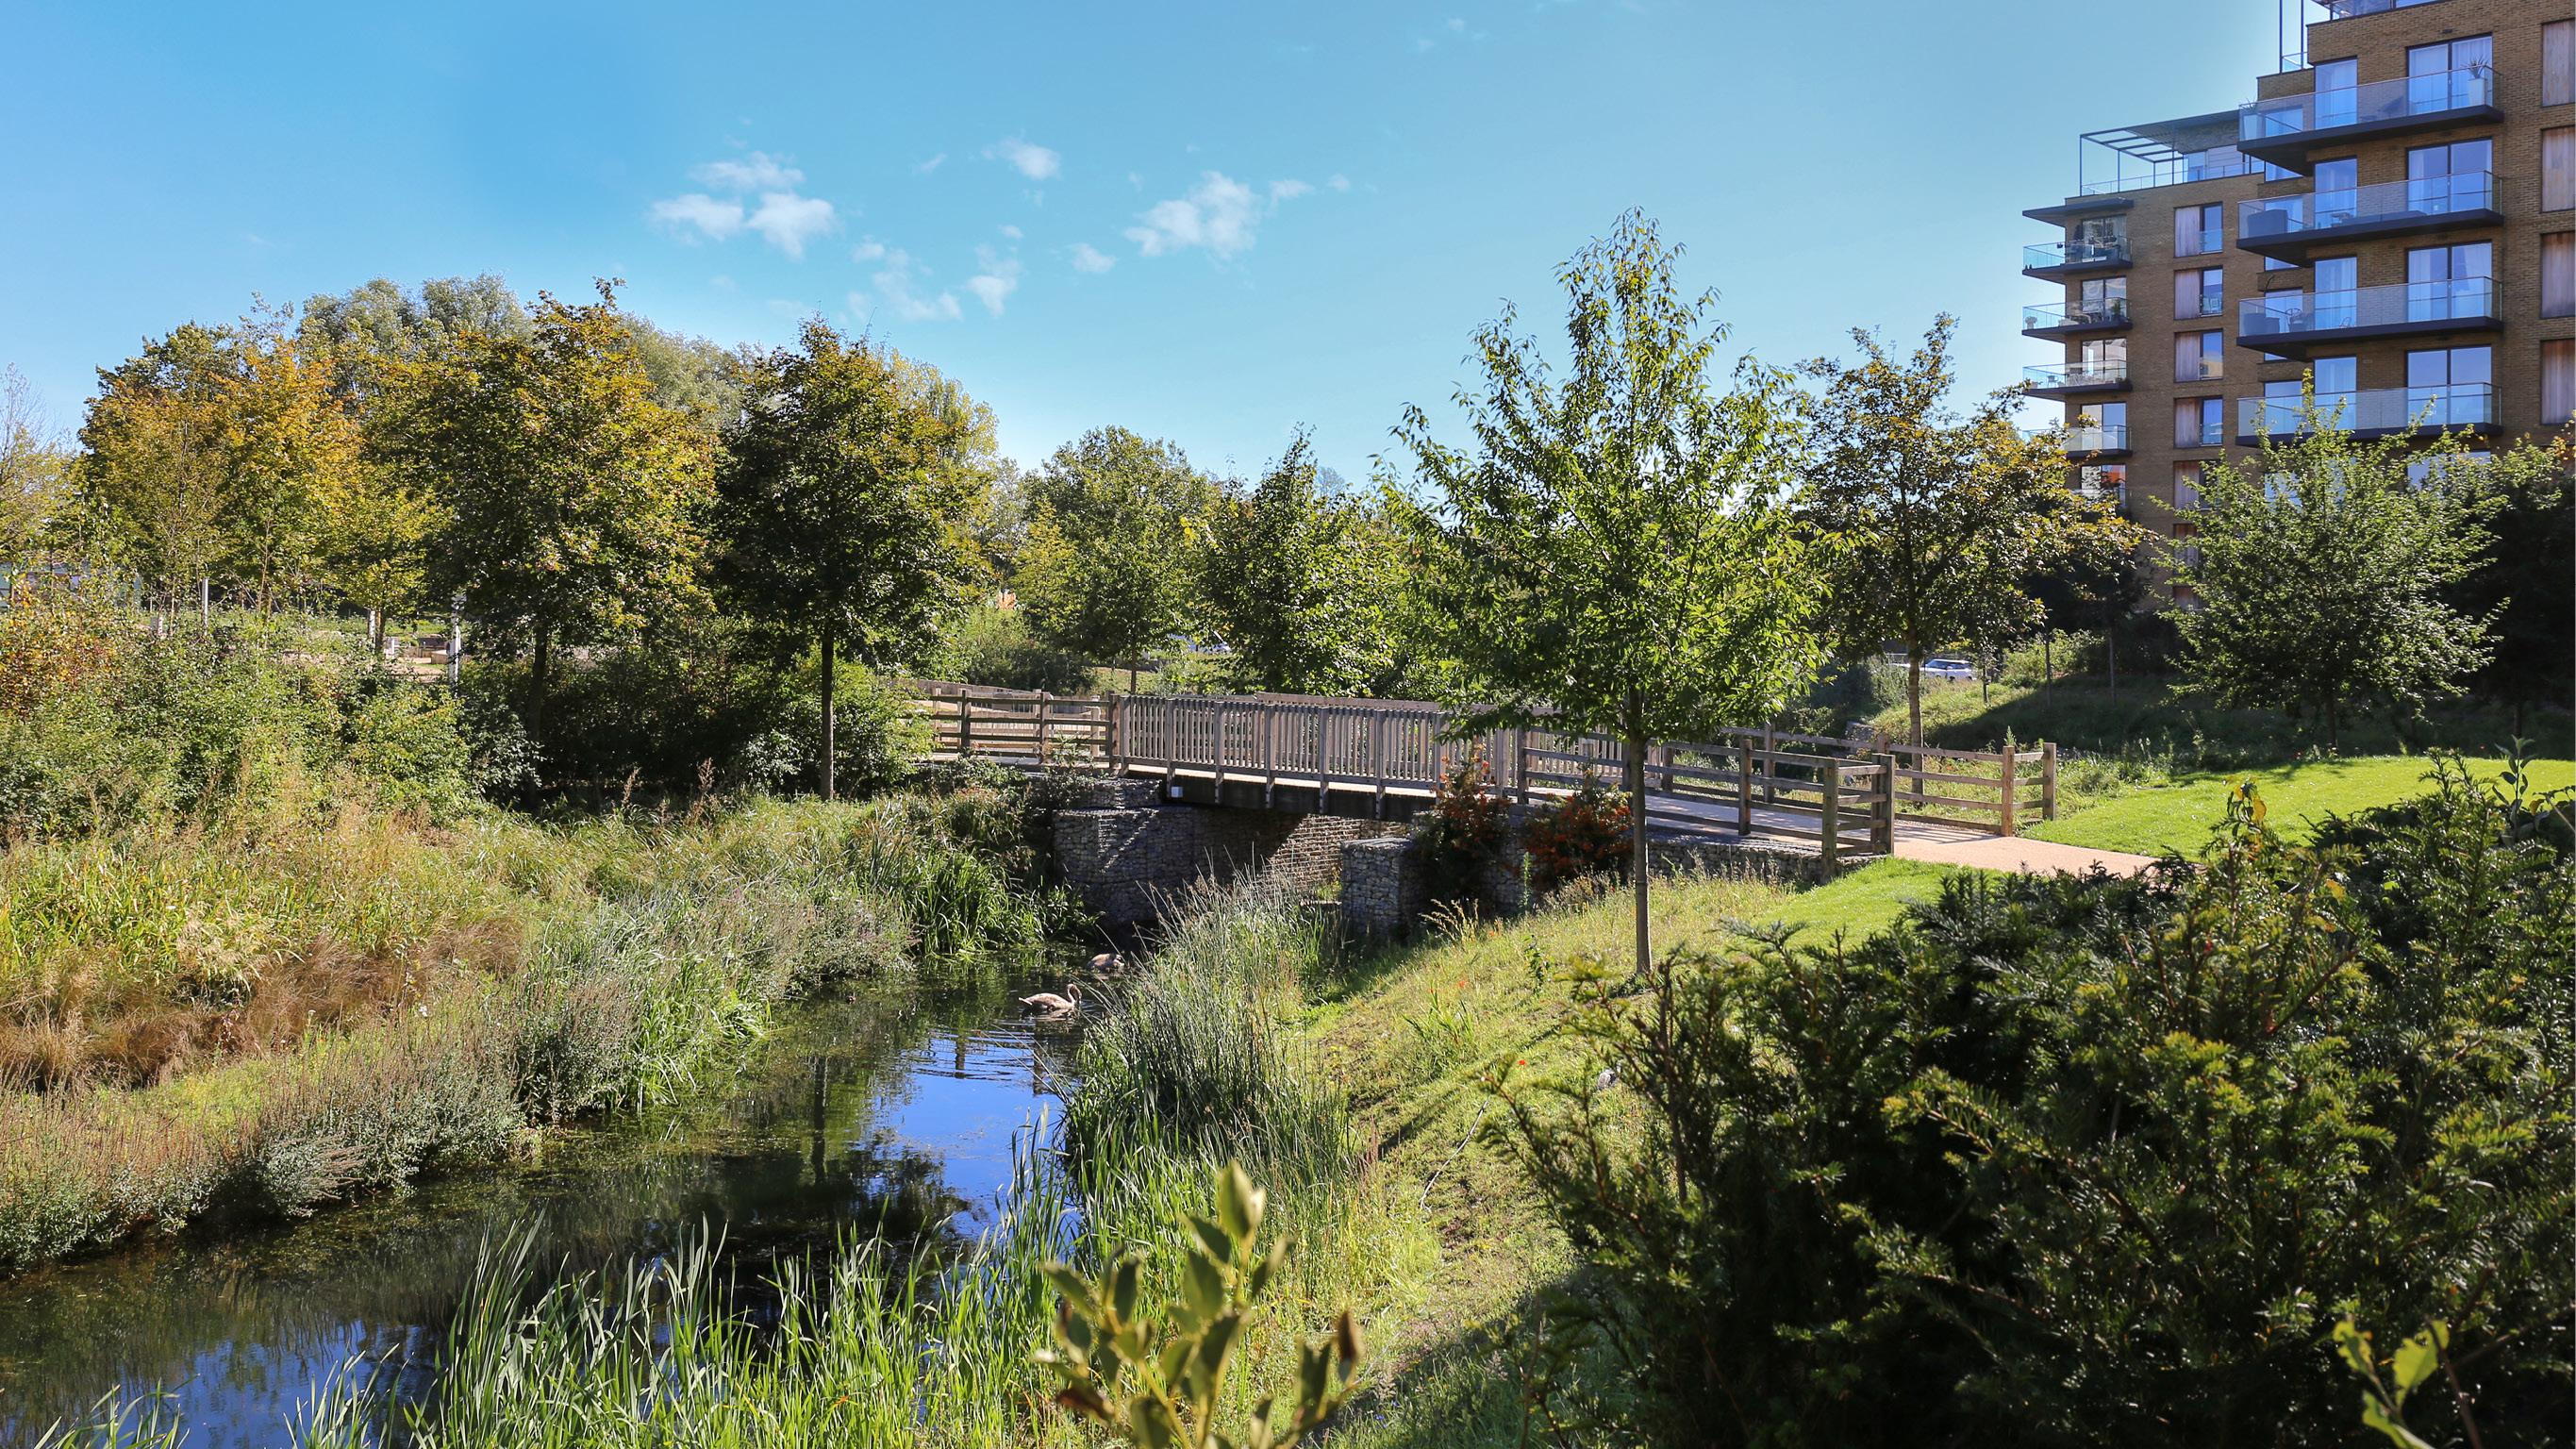 North Cator Park, Kidbrooke Village